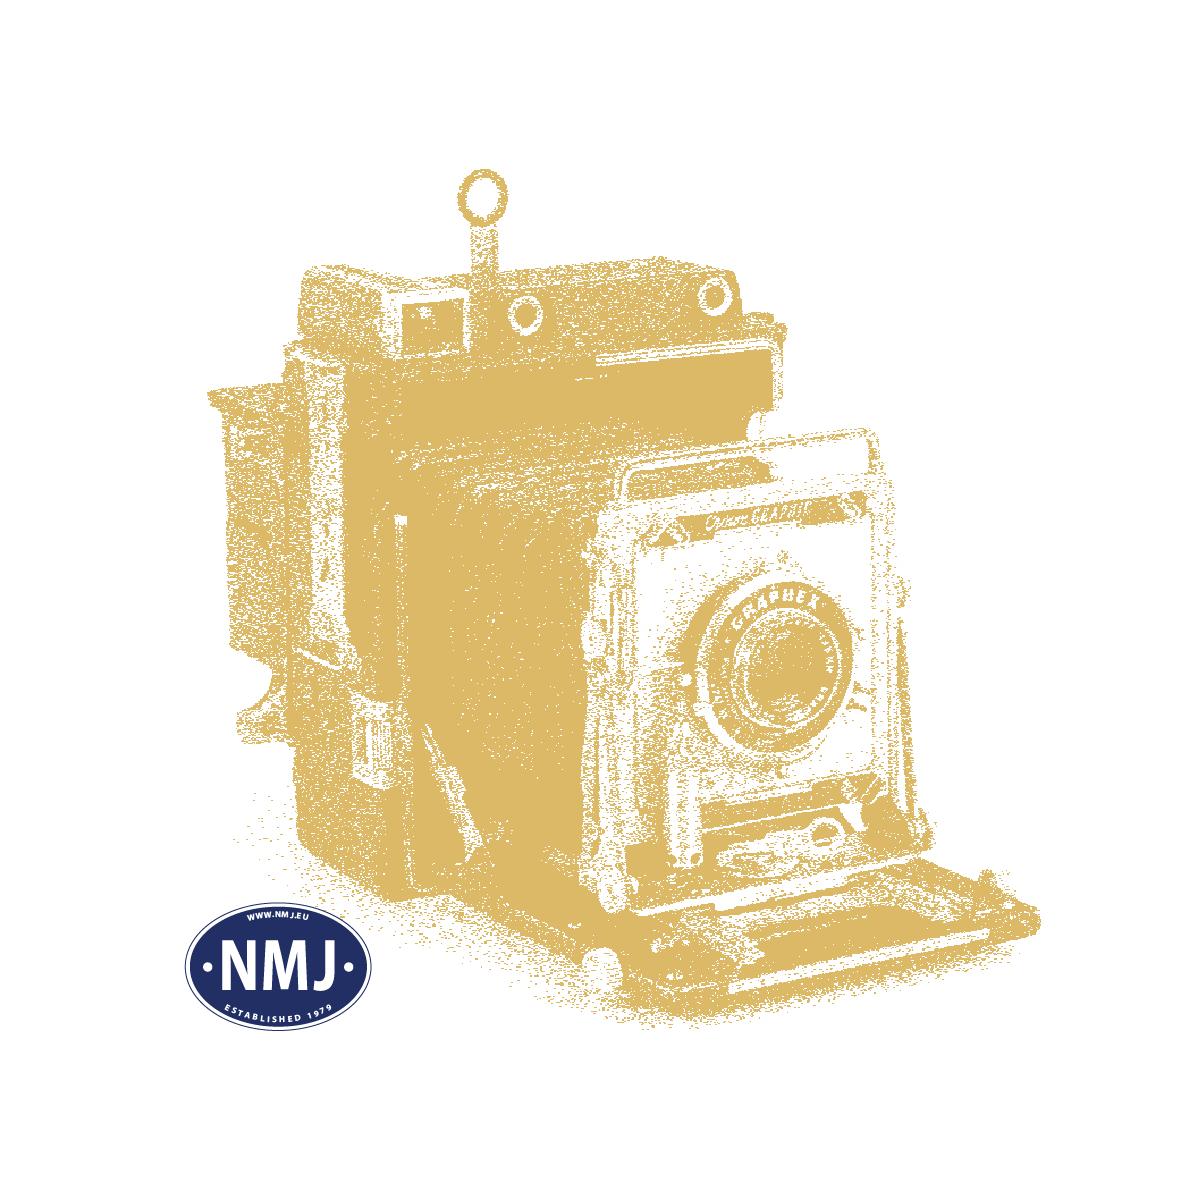 NMJT204.001 - NMJ Topline SJ Bo1.4898, 2 kl. Personvogn, rund SJ logo